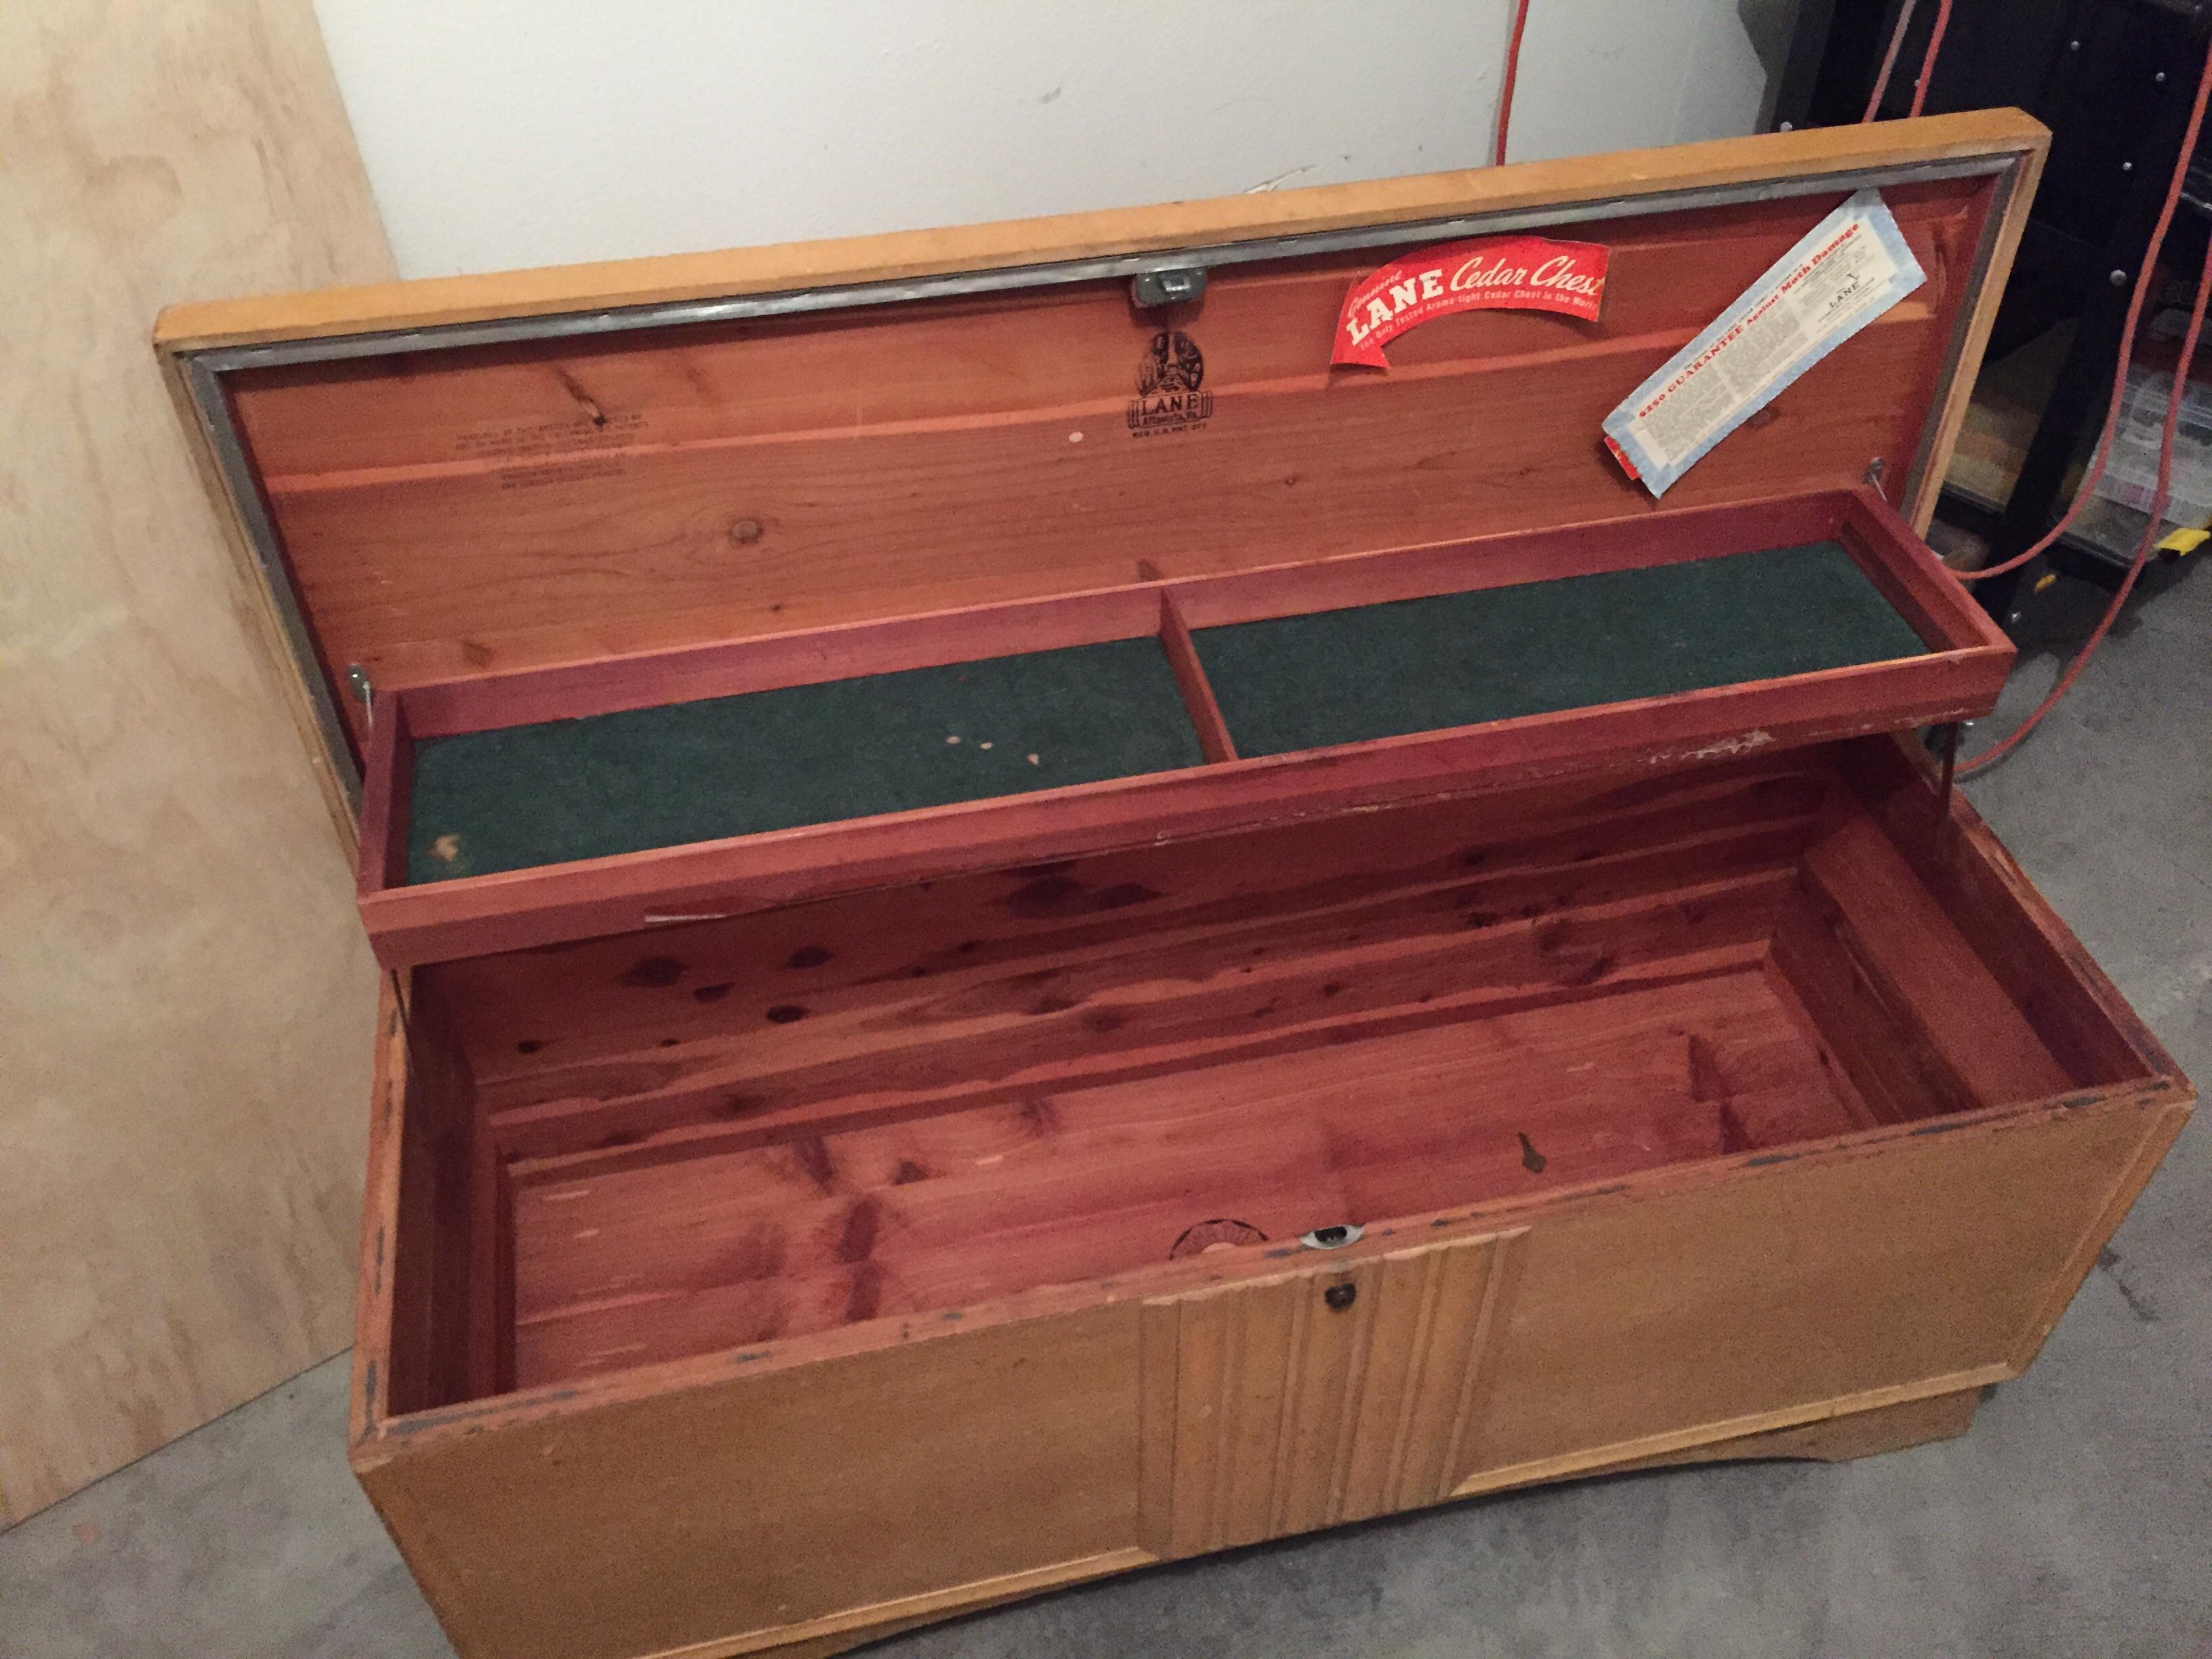 1952 Lane Cedar Chest Antique Appraisal Instappraisal